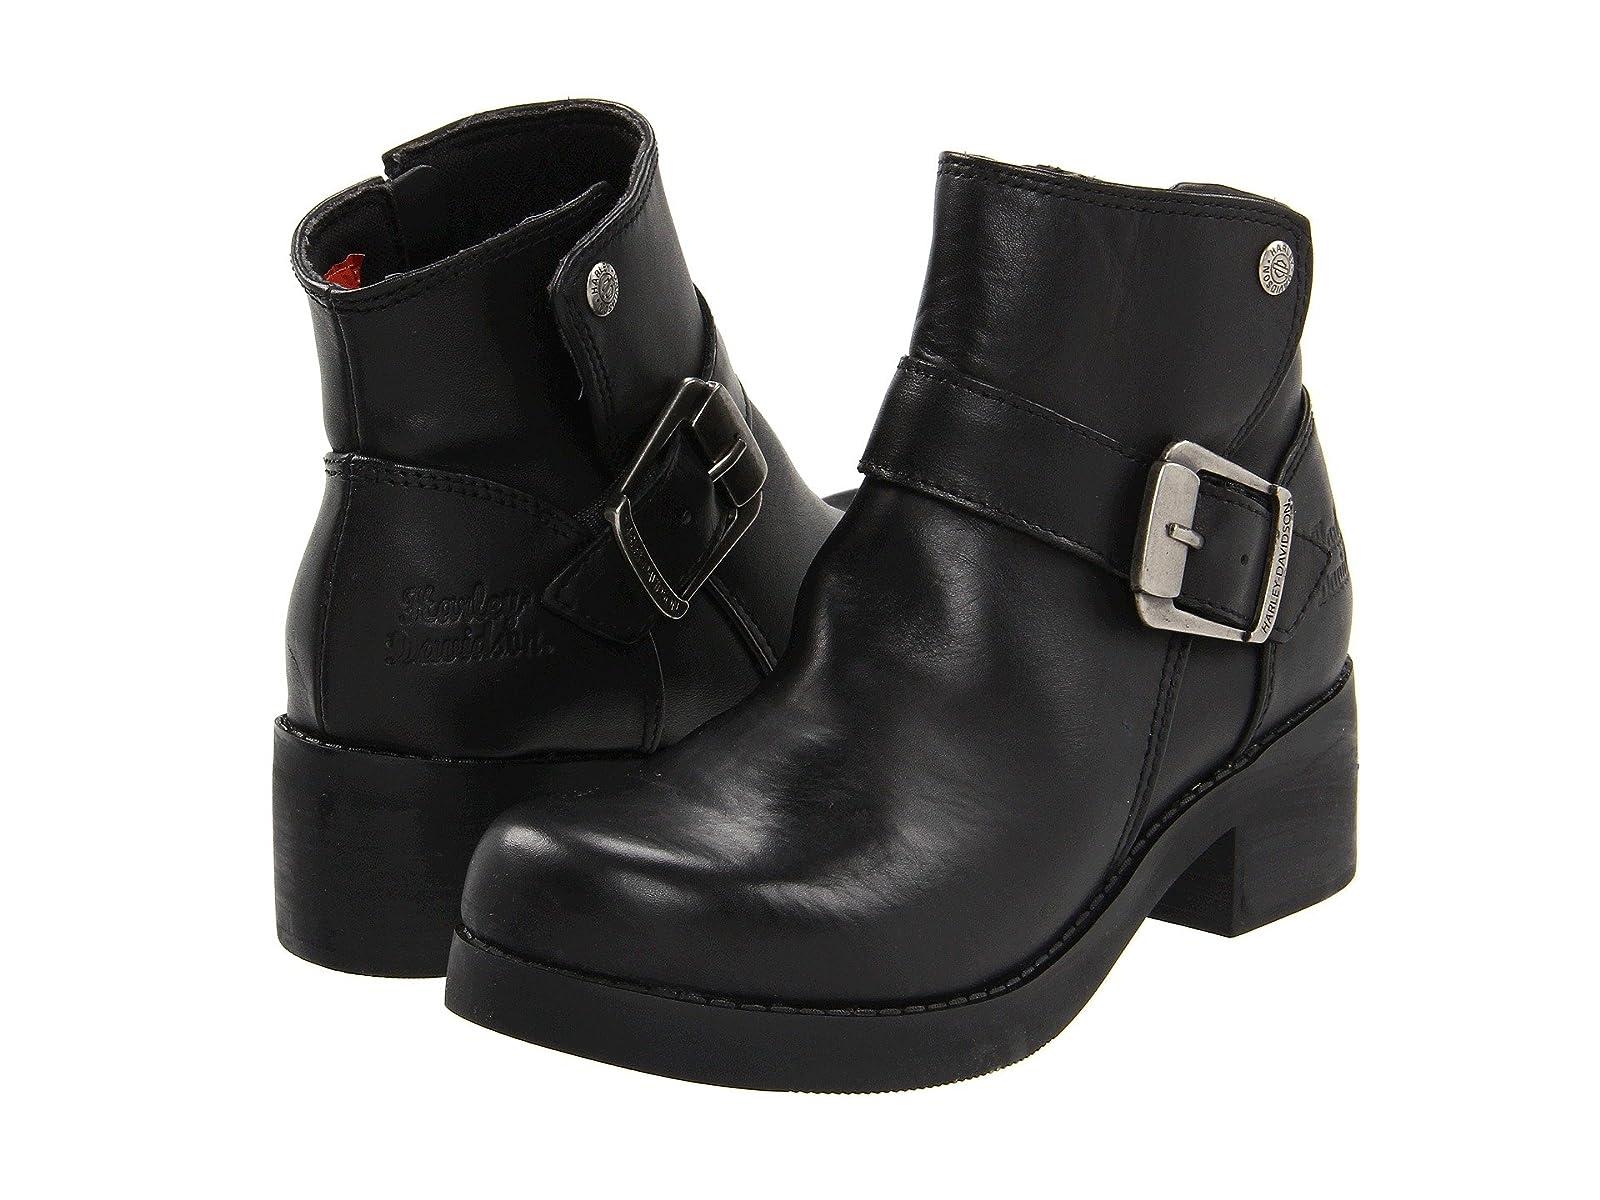 Harley-Davidson KhariAffordable and distinctive shoes